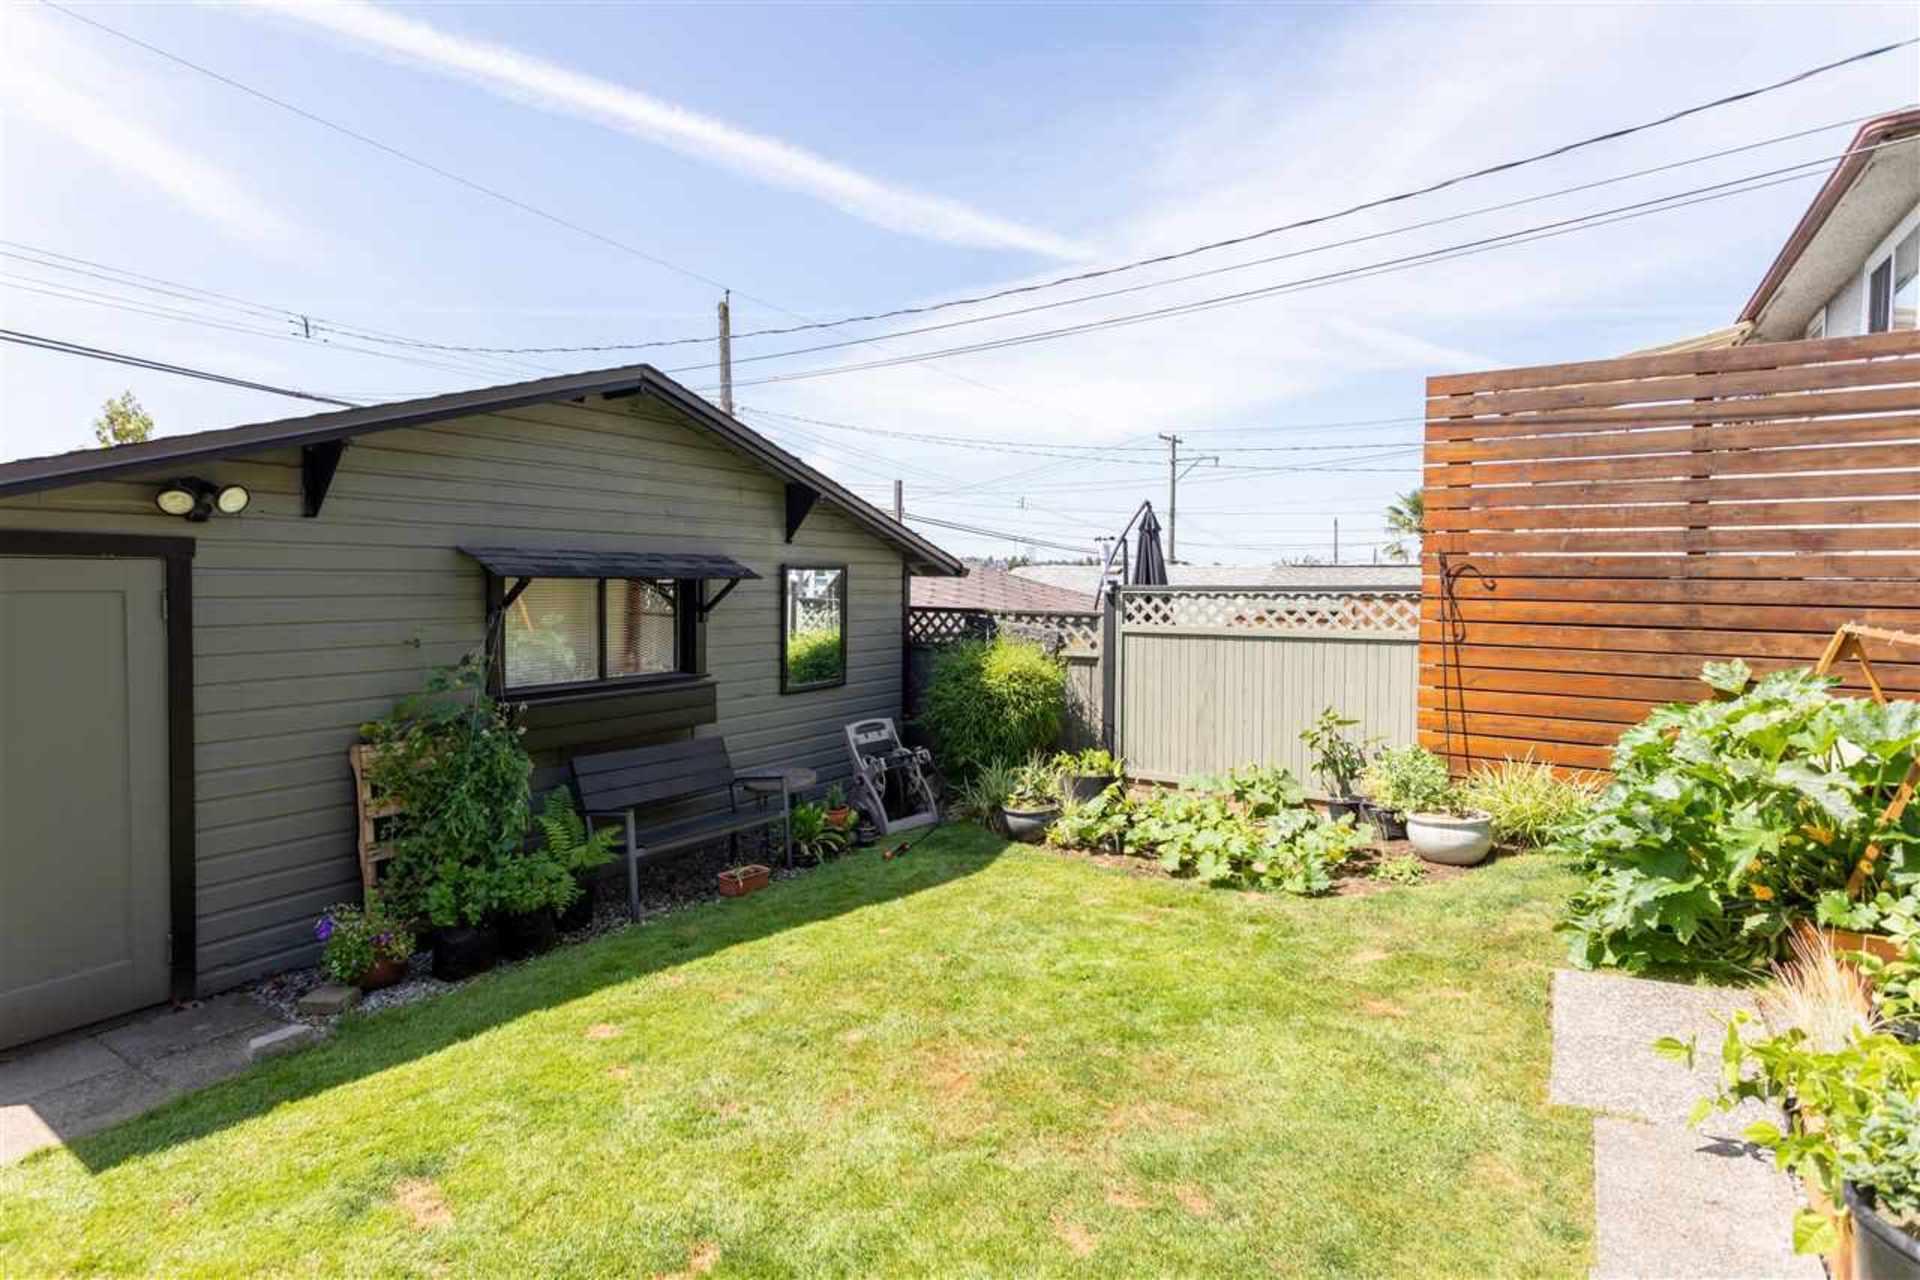 3912-parker-street-willingdon-heights-burnaby-north-38 at 3912 Parker Street, Willingdon Heights, Burnaby North